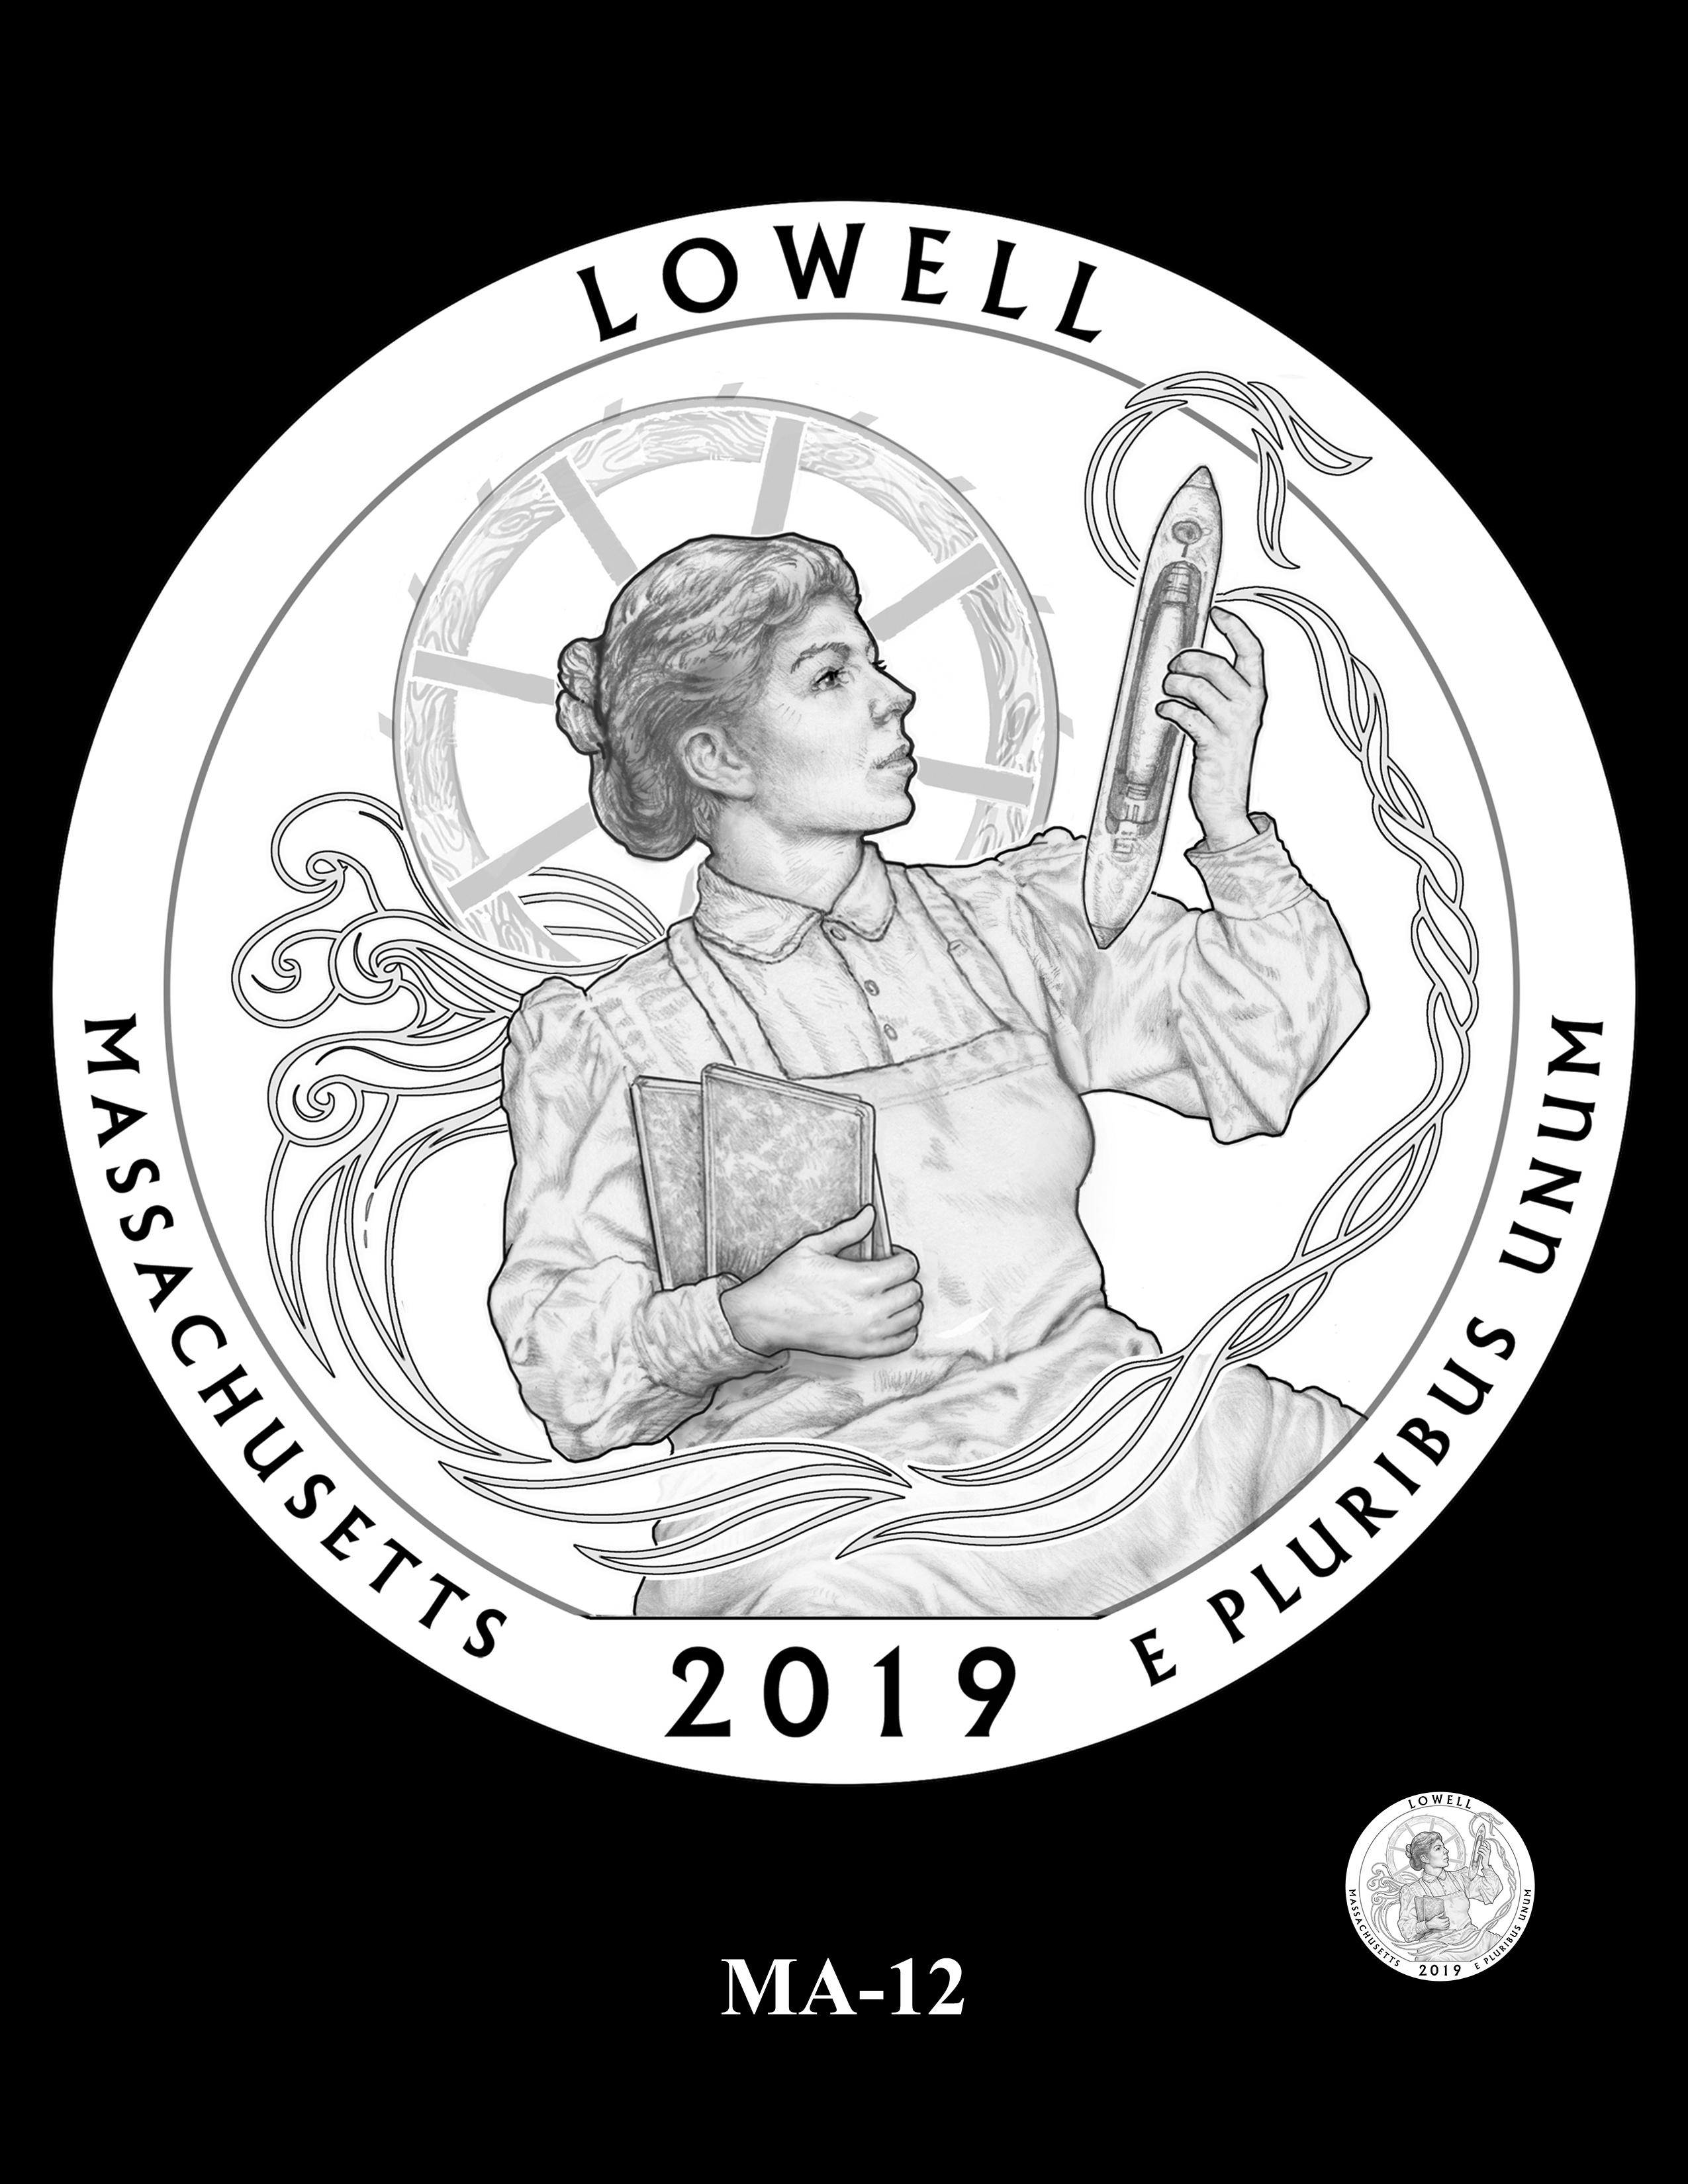 MA-12 -- 2019 America the Beautiful Quarters® Program